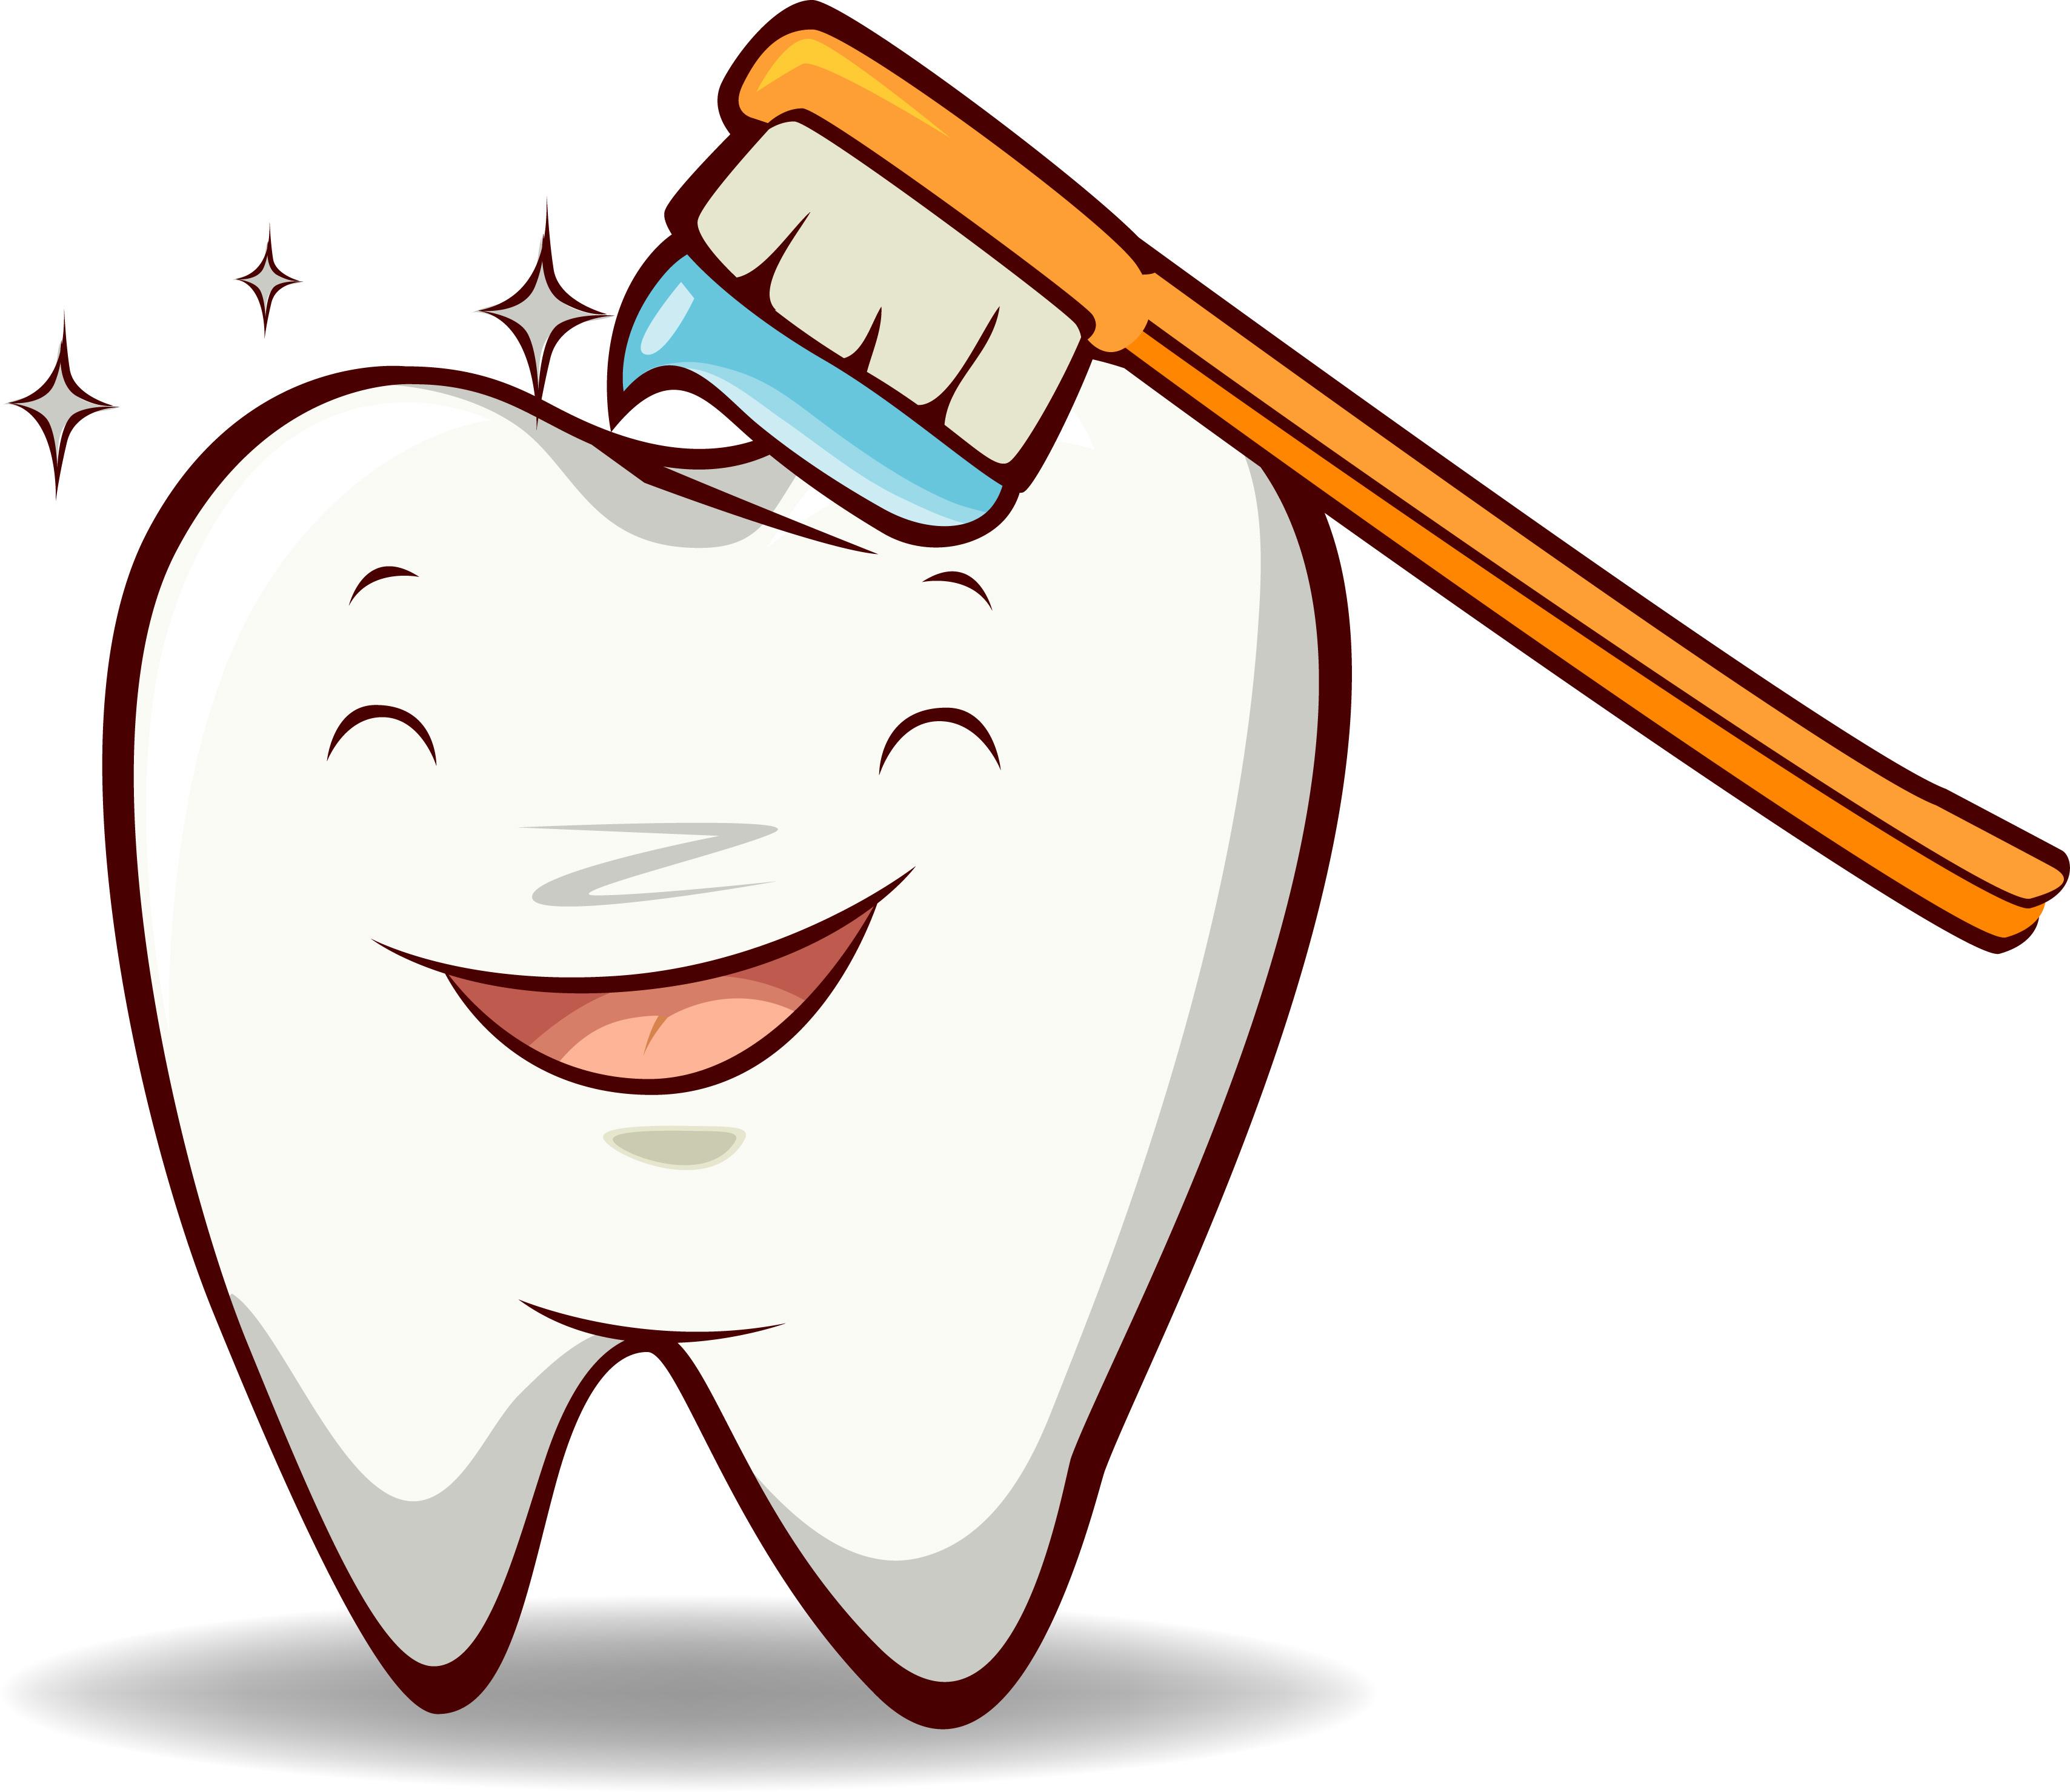 Brushing Teeth Clip Art - Cliparts.co